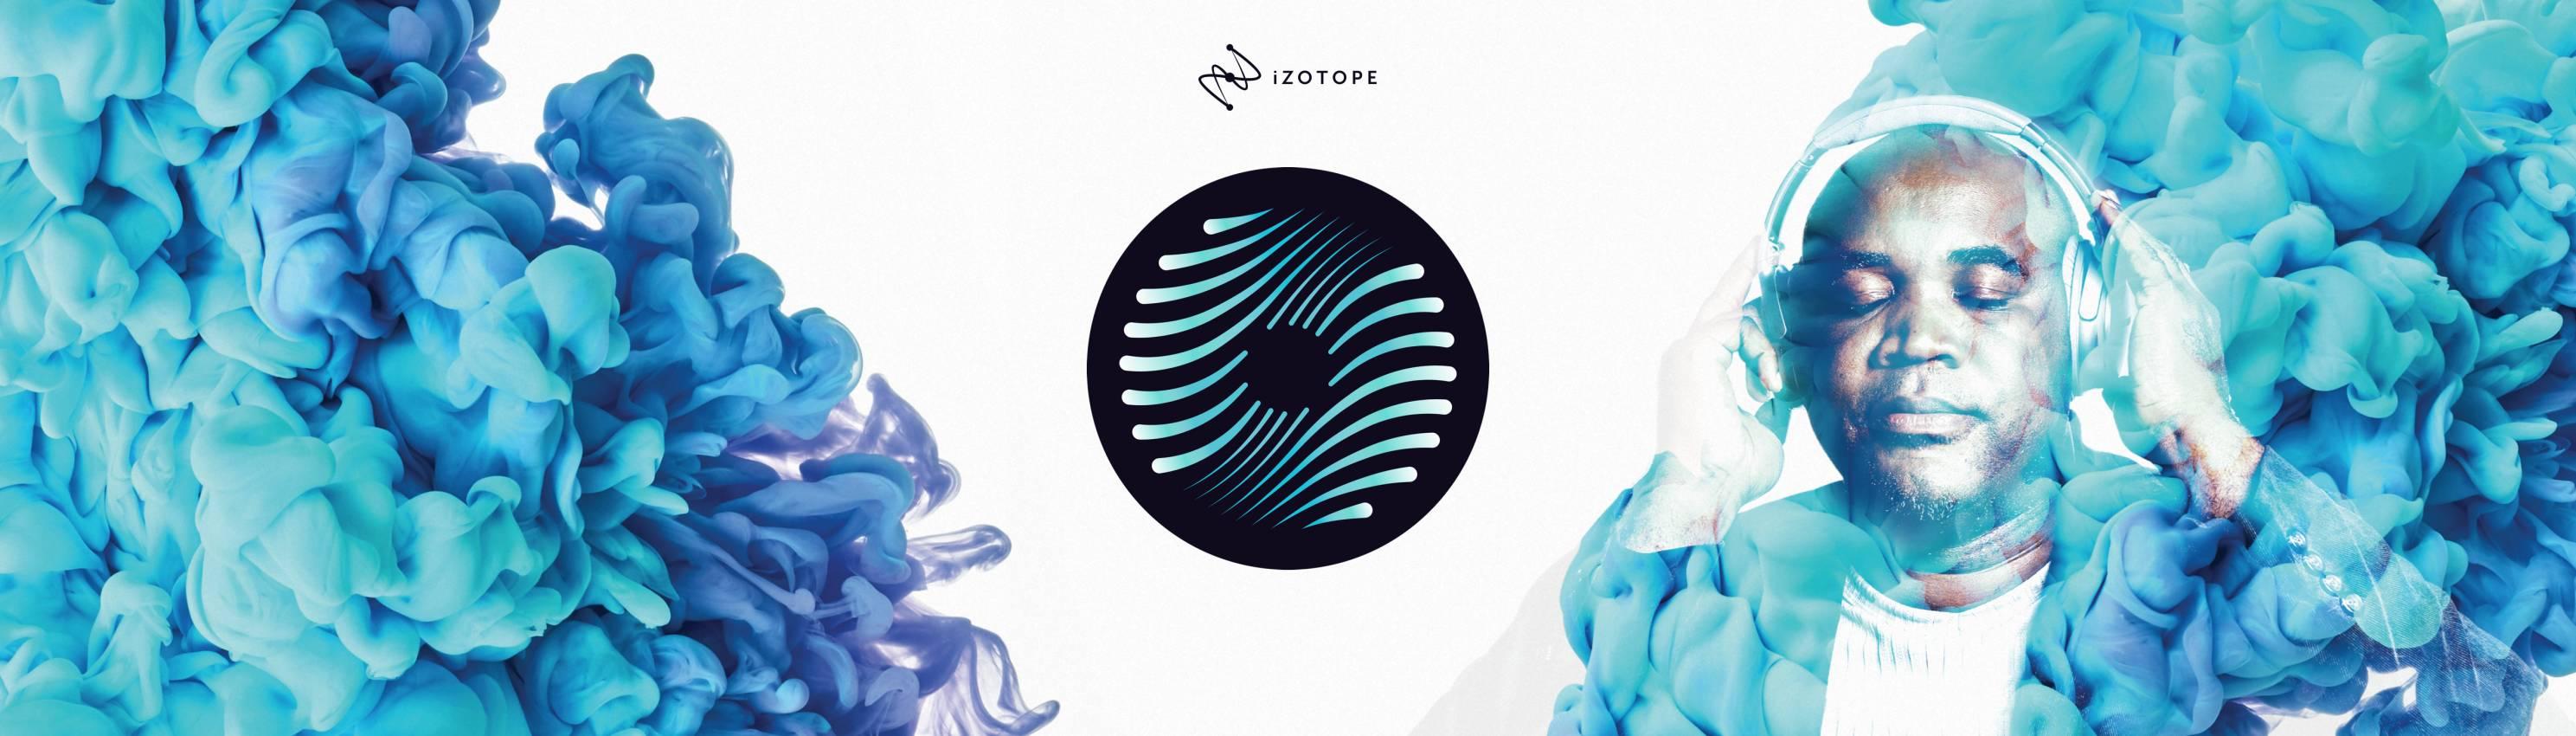 iZotope Ozone 8 Standard mastering plugin